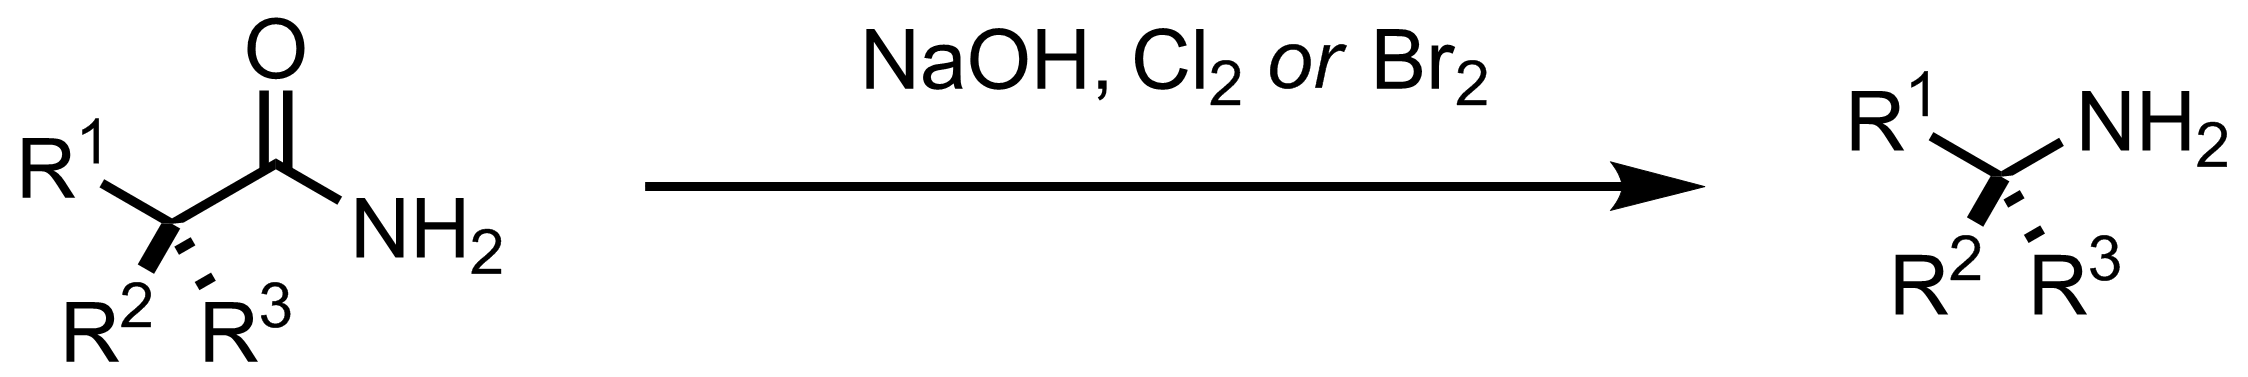 Schematic representation of the Hofmann Rearrangement.